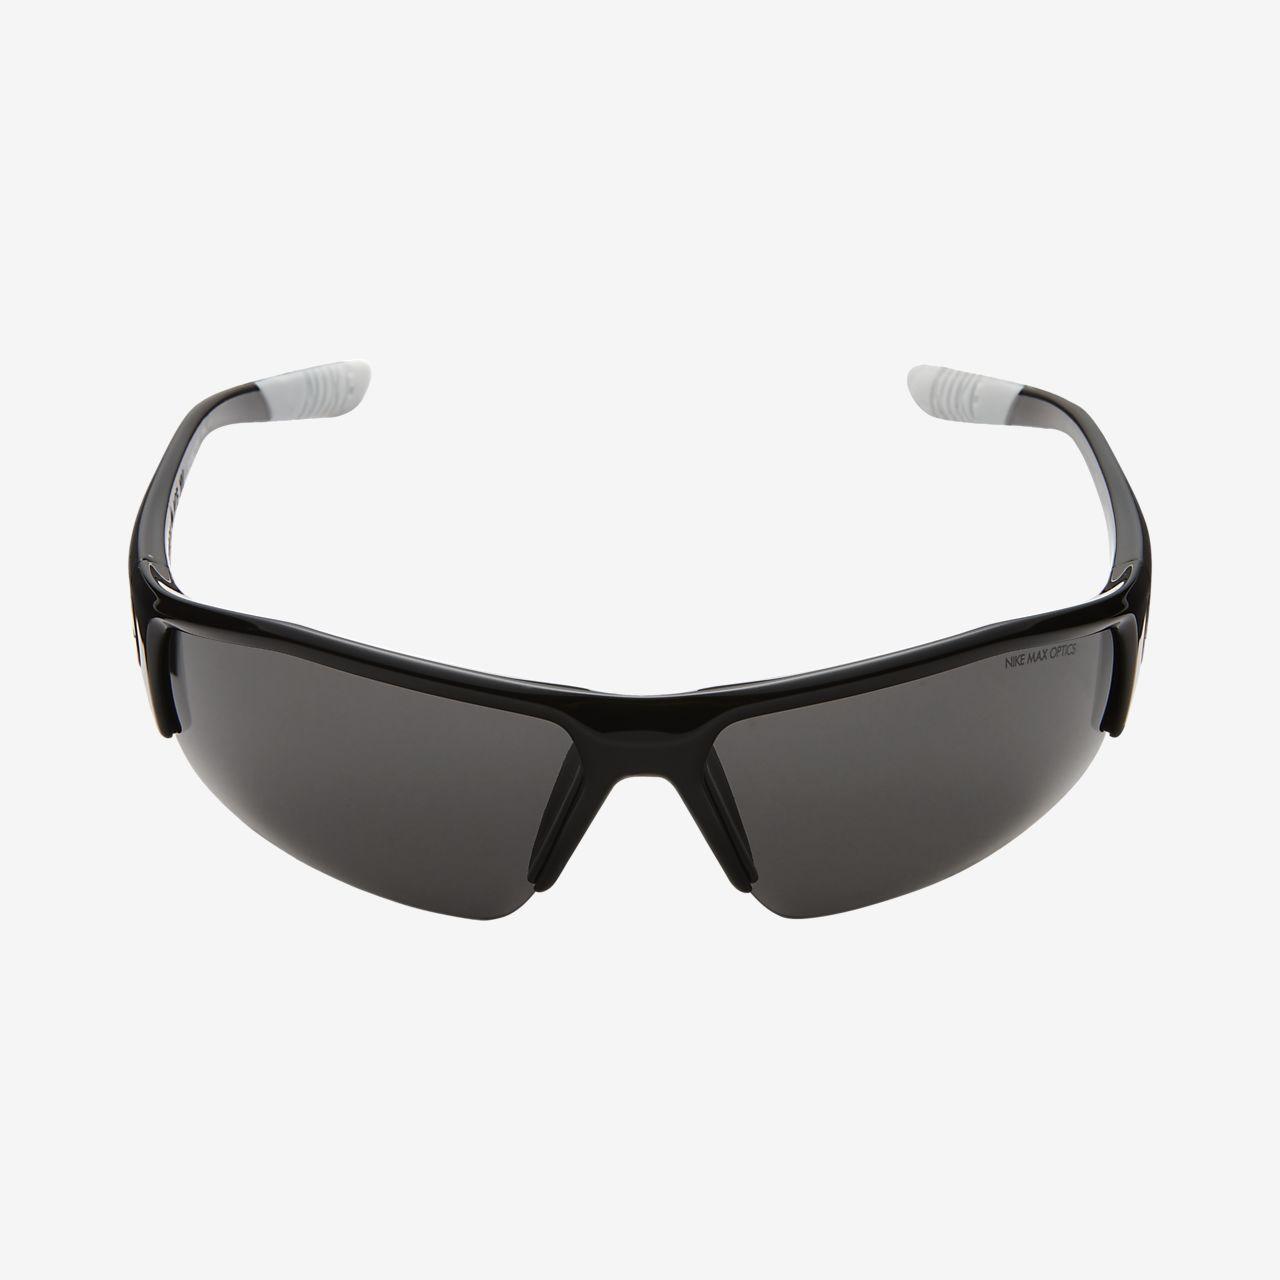 a107e13866172 Nike Skylon Ace XV Sunglasses